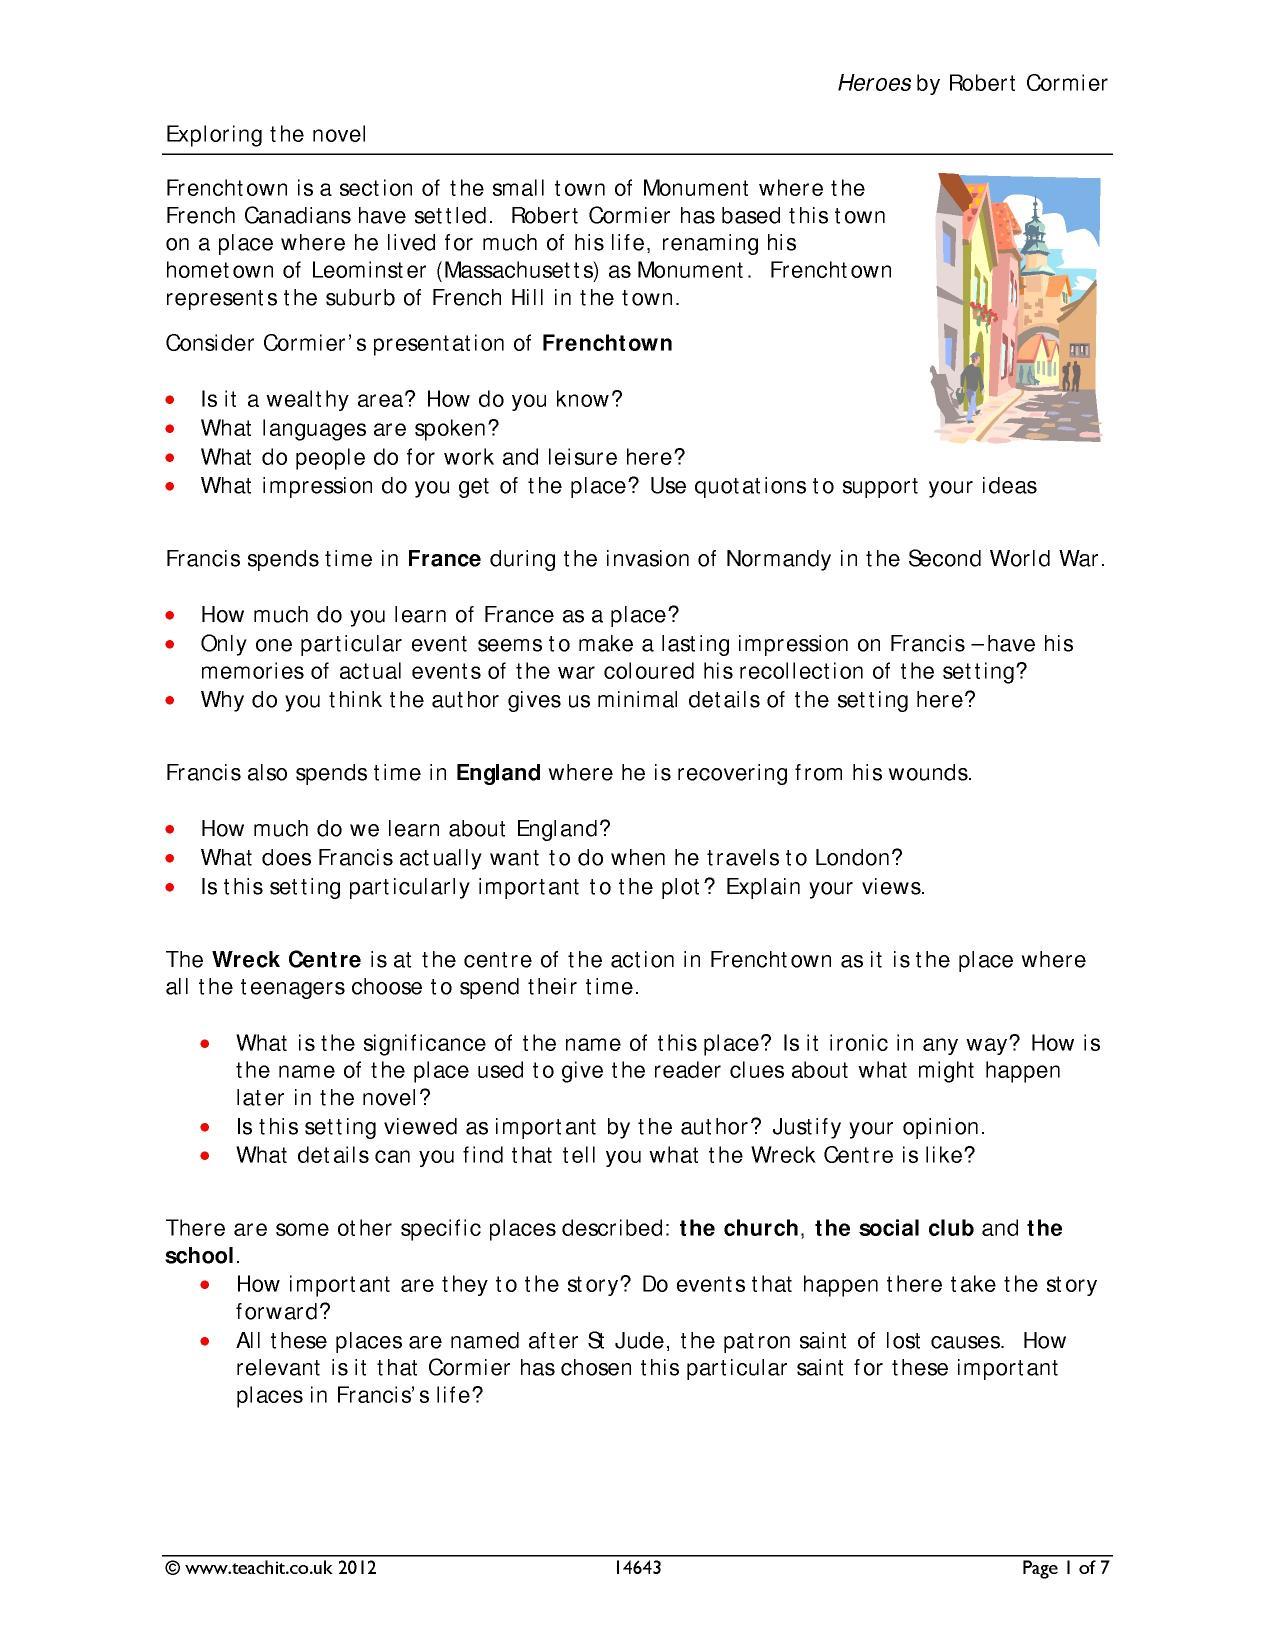 W b yeats essay questions